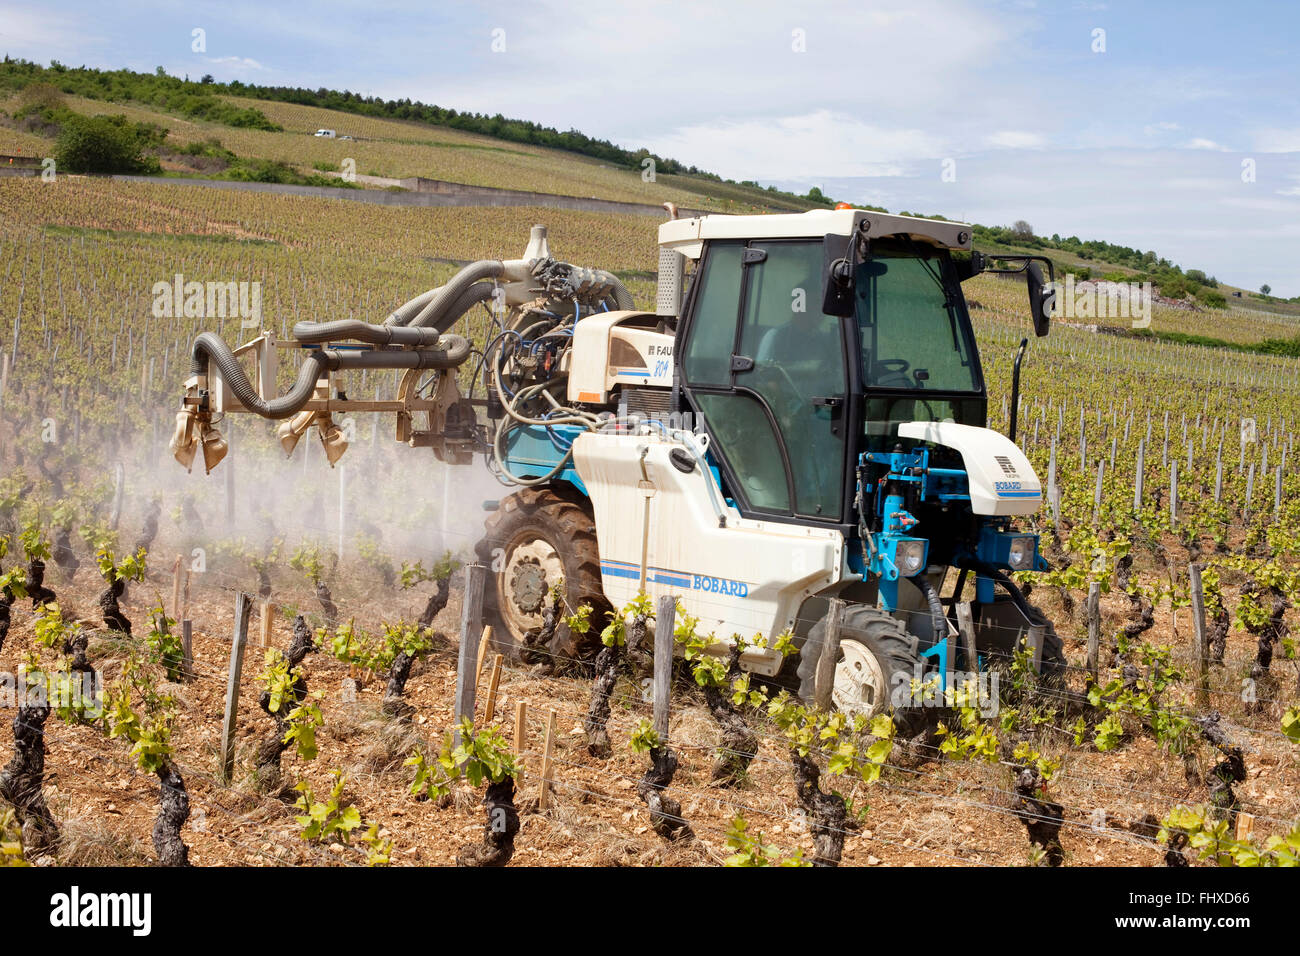 Wine growing in Burgundy ('Bourgogne') - Stock Image